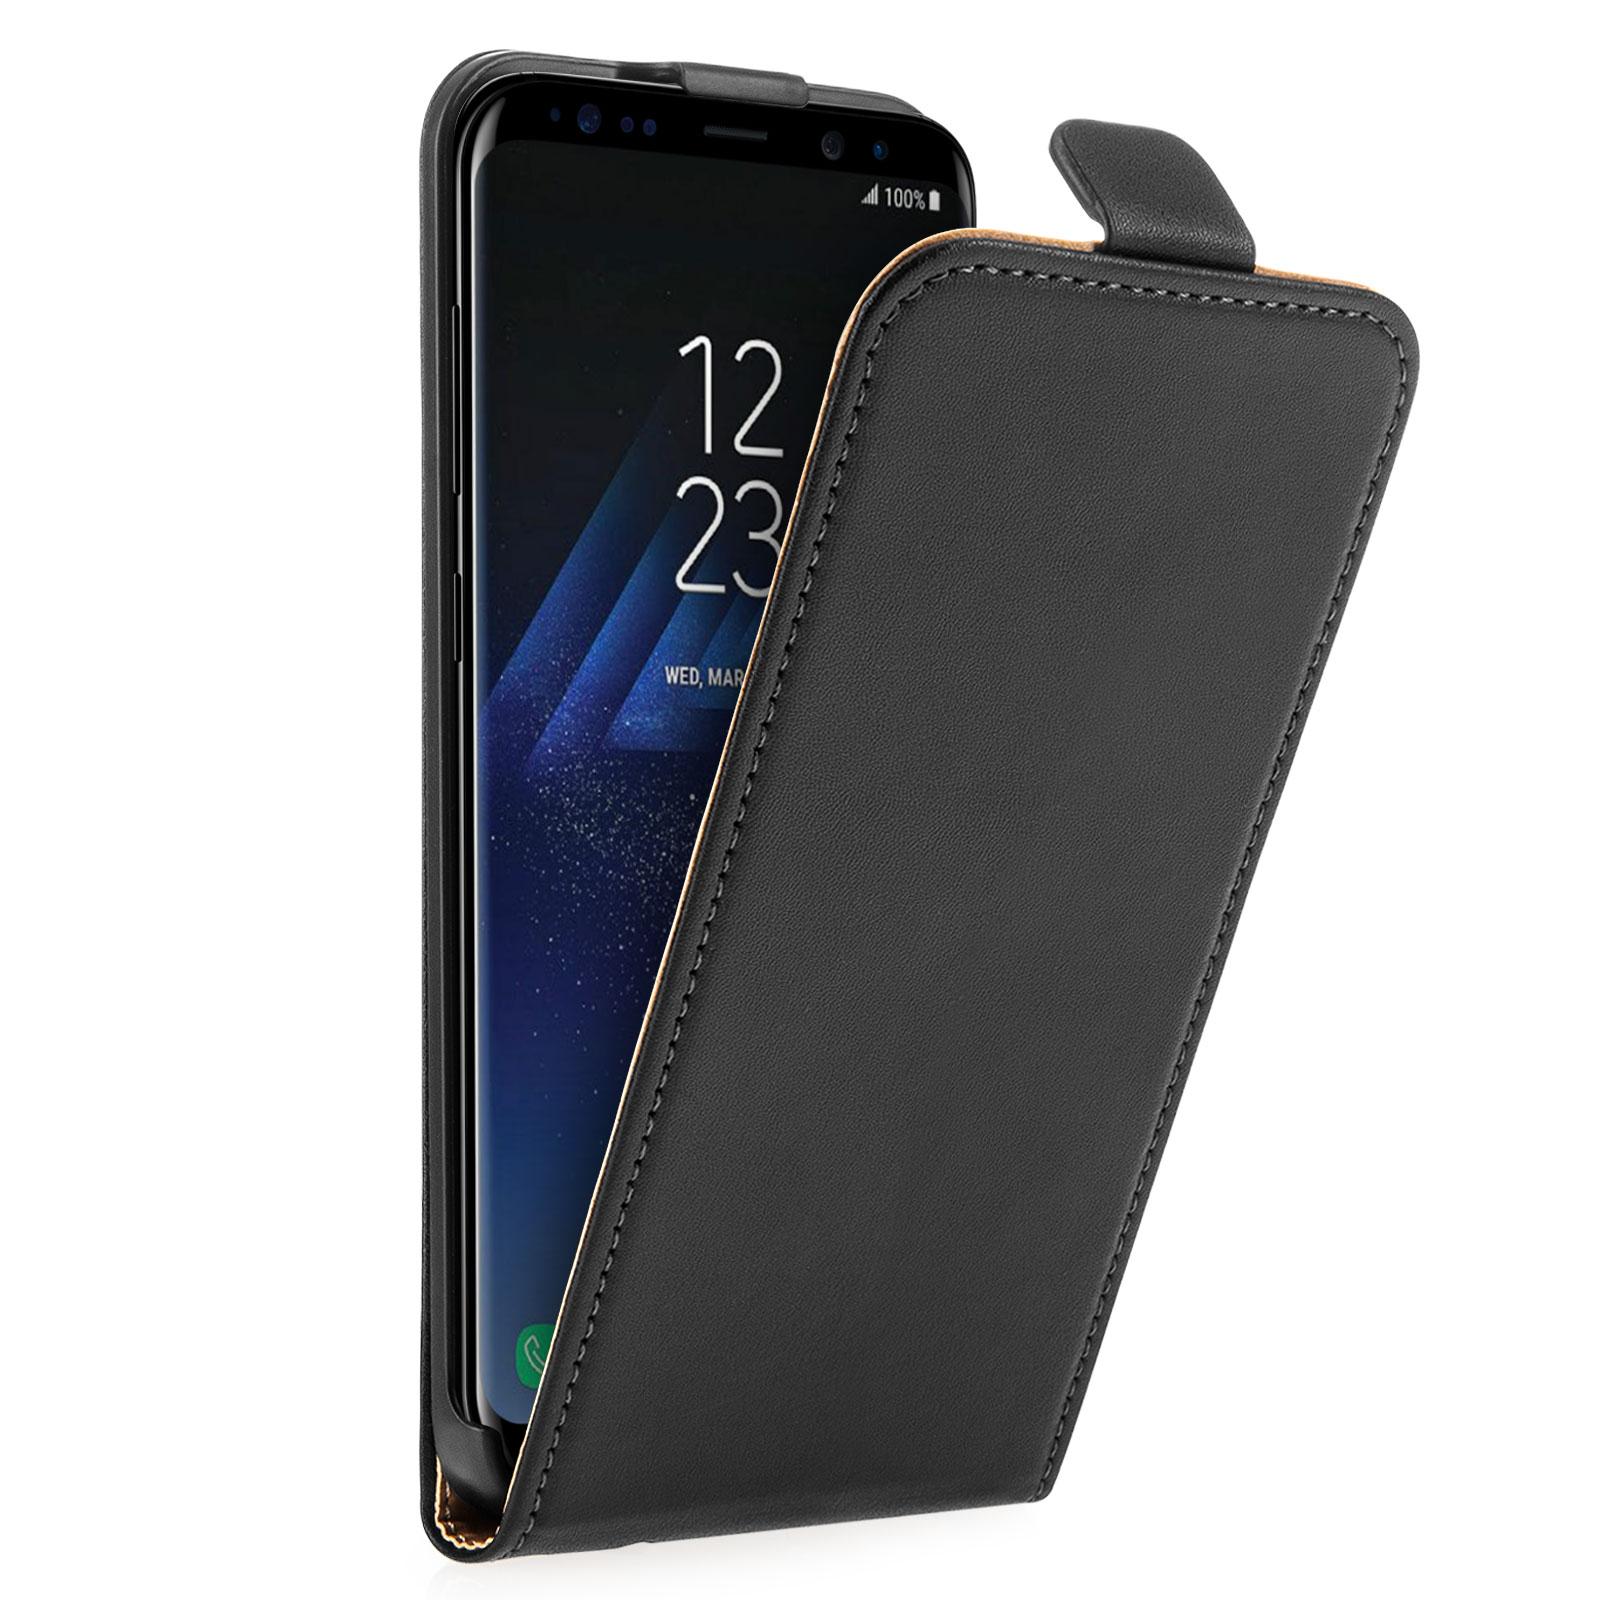 Caseflex Δερμάτινη Flip Θήκη Samsung Galaxy S8 - Black (SA-EA09-Z663)